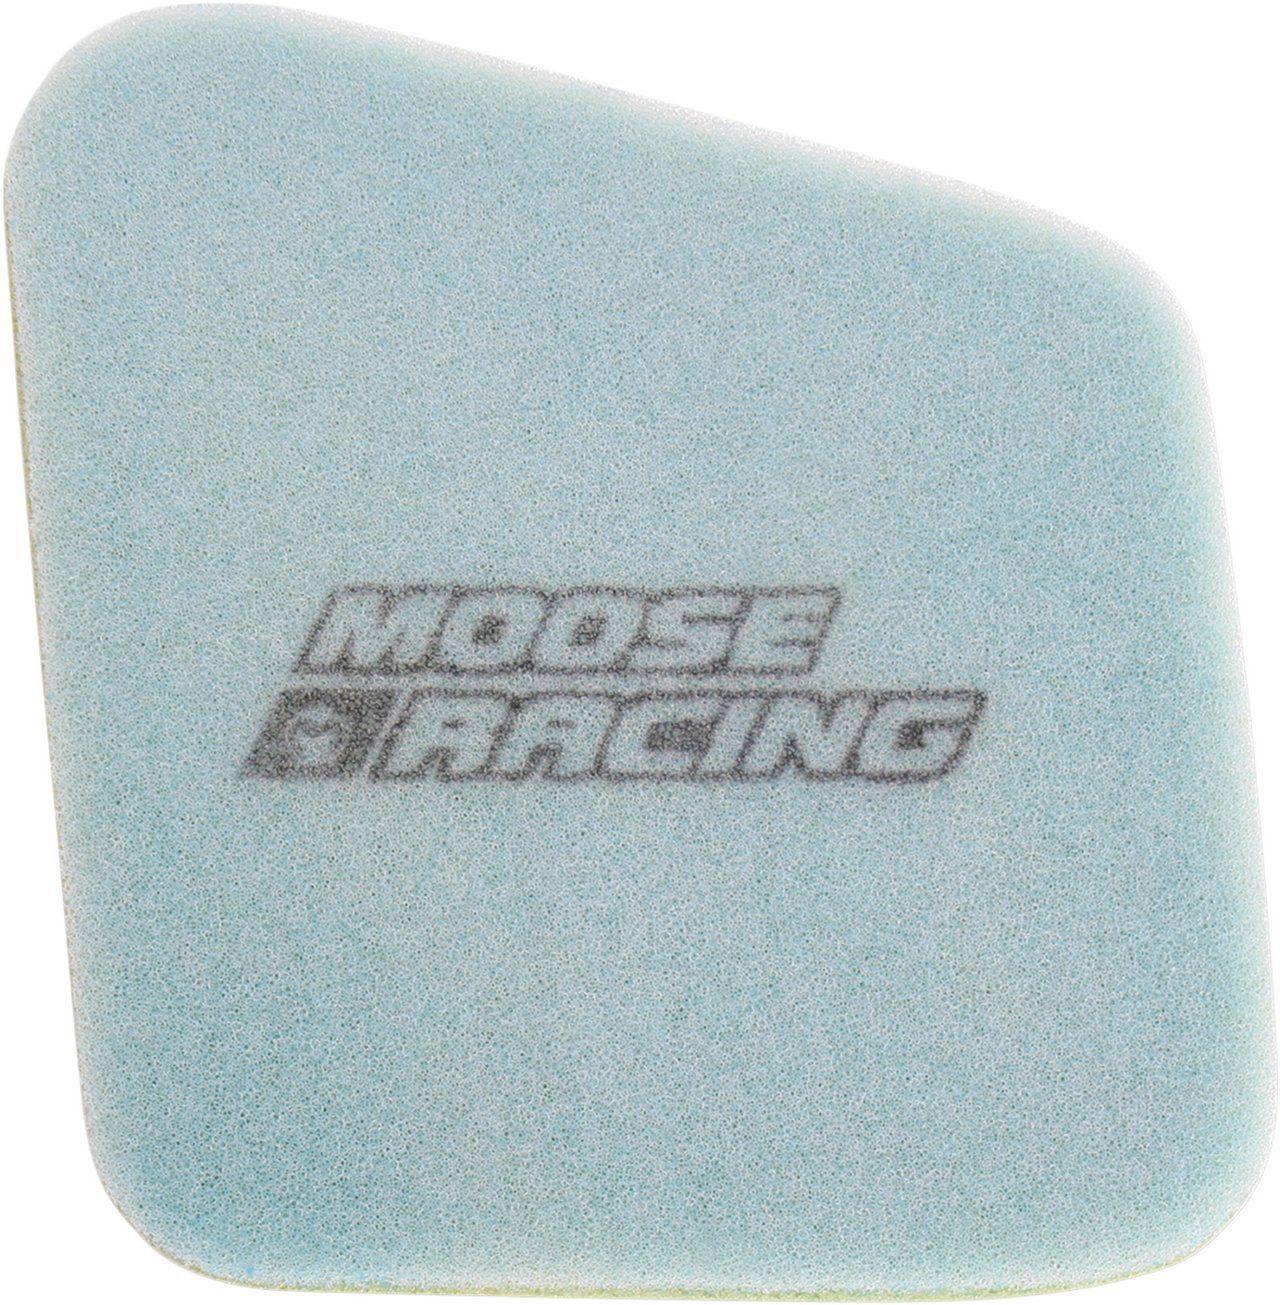 【MOOSE RACING】PPO (PRECISION PRE-OILED) 空氣濾芯 [1011-2549] - 「Webike-摩托百貨」